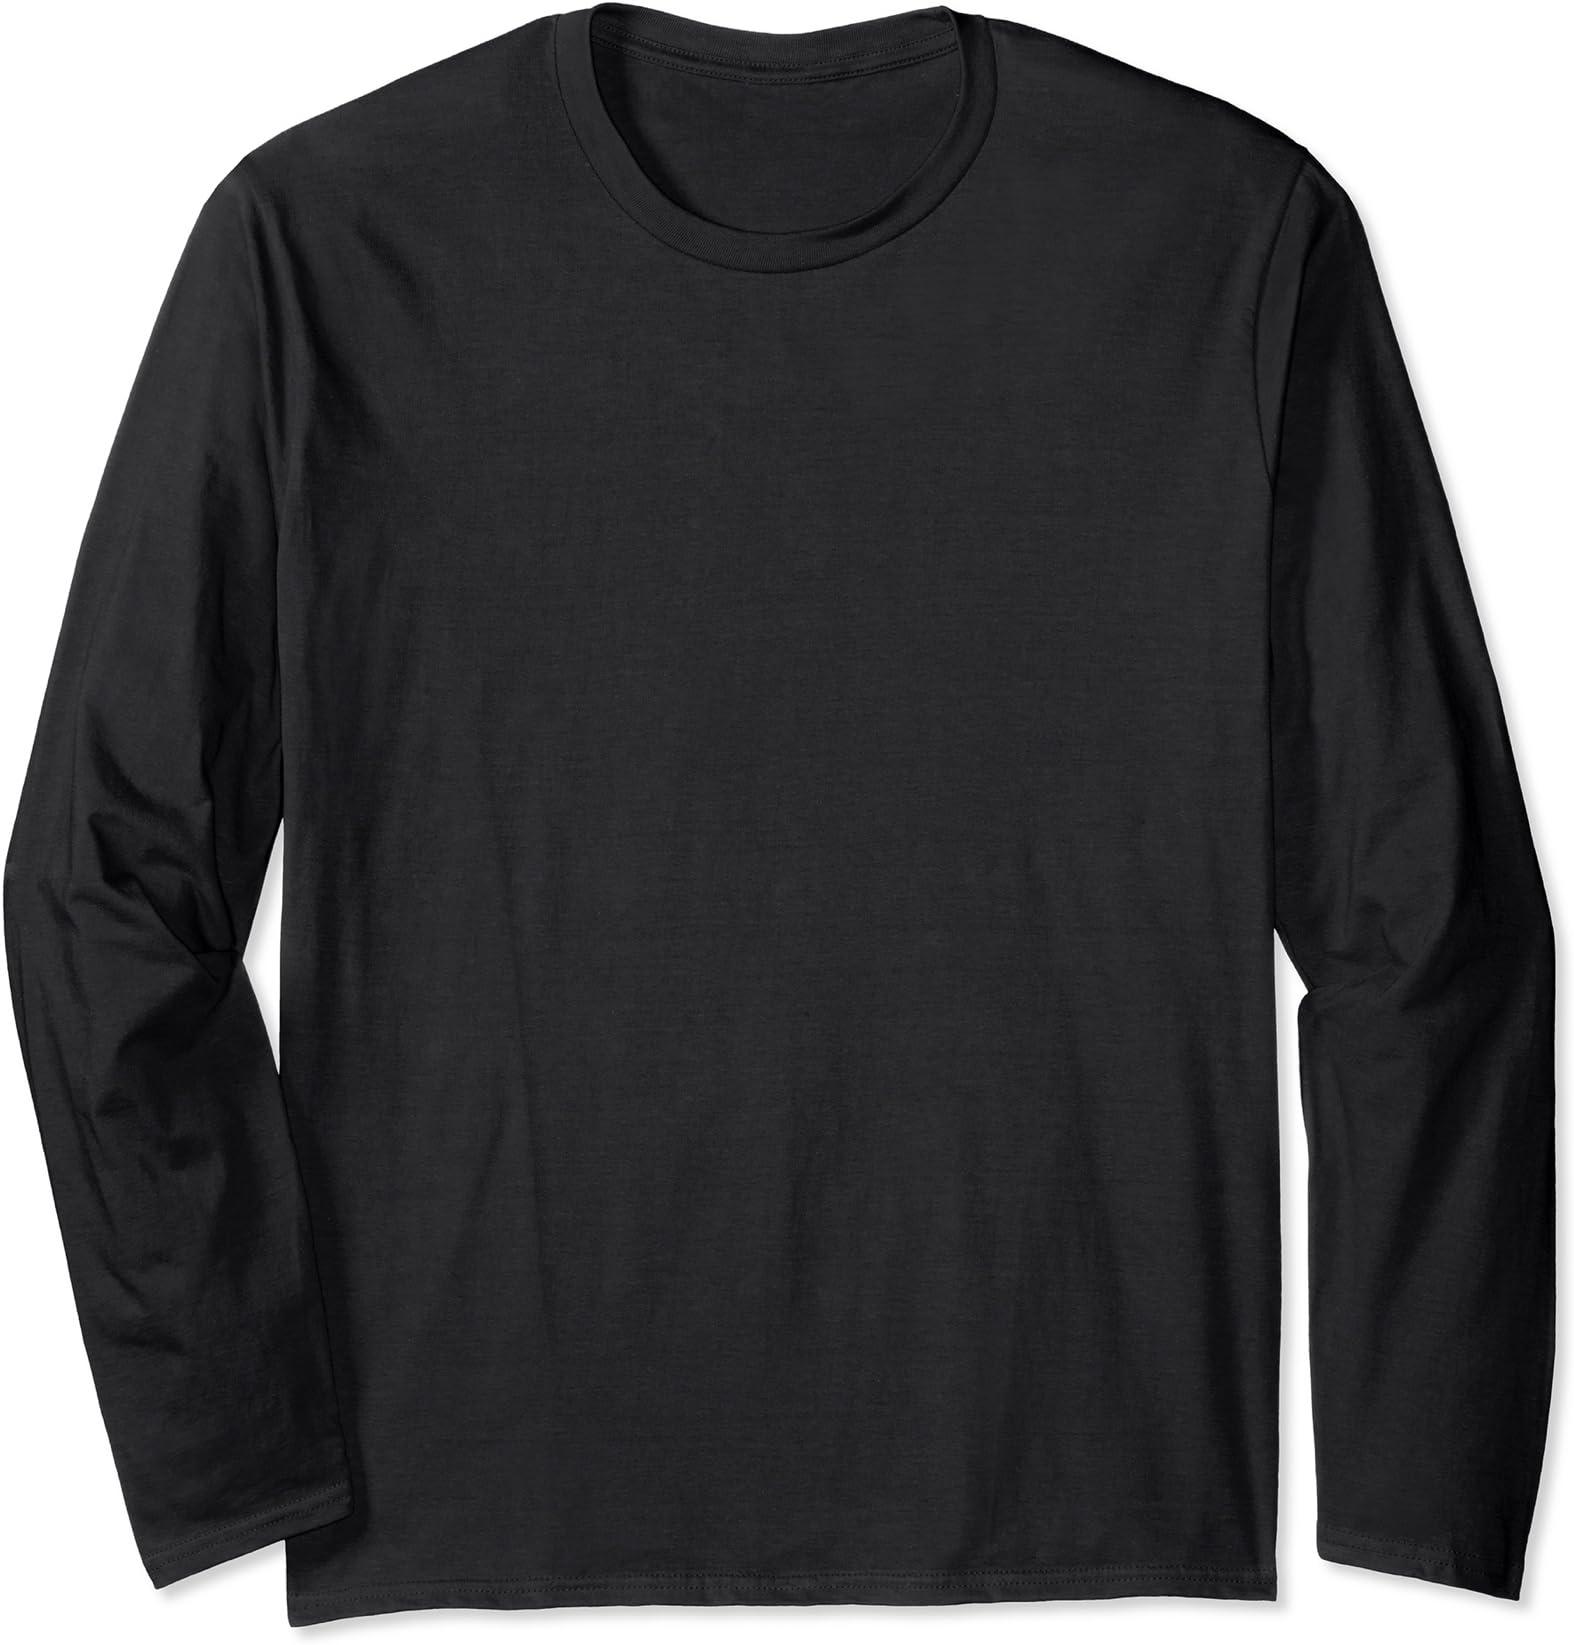 Inktastic Mardi Gras 2019 Fleur De Lis Holiday Long Sleeve T-Shirt New Orleans